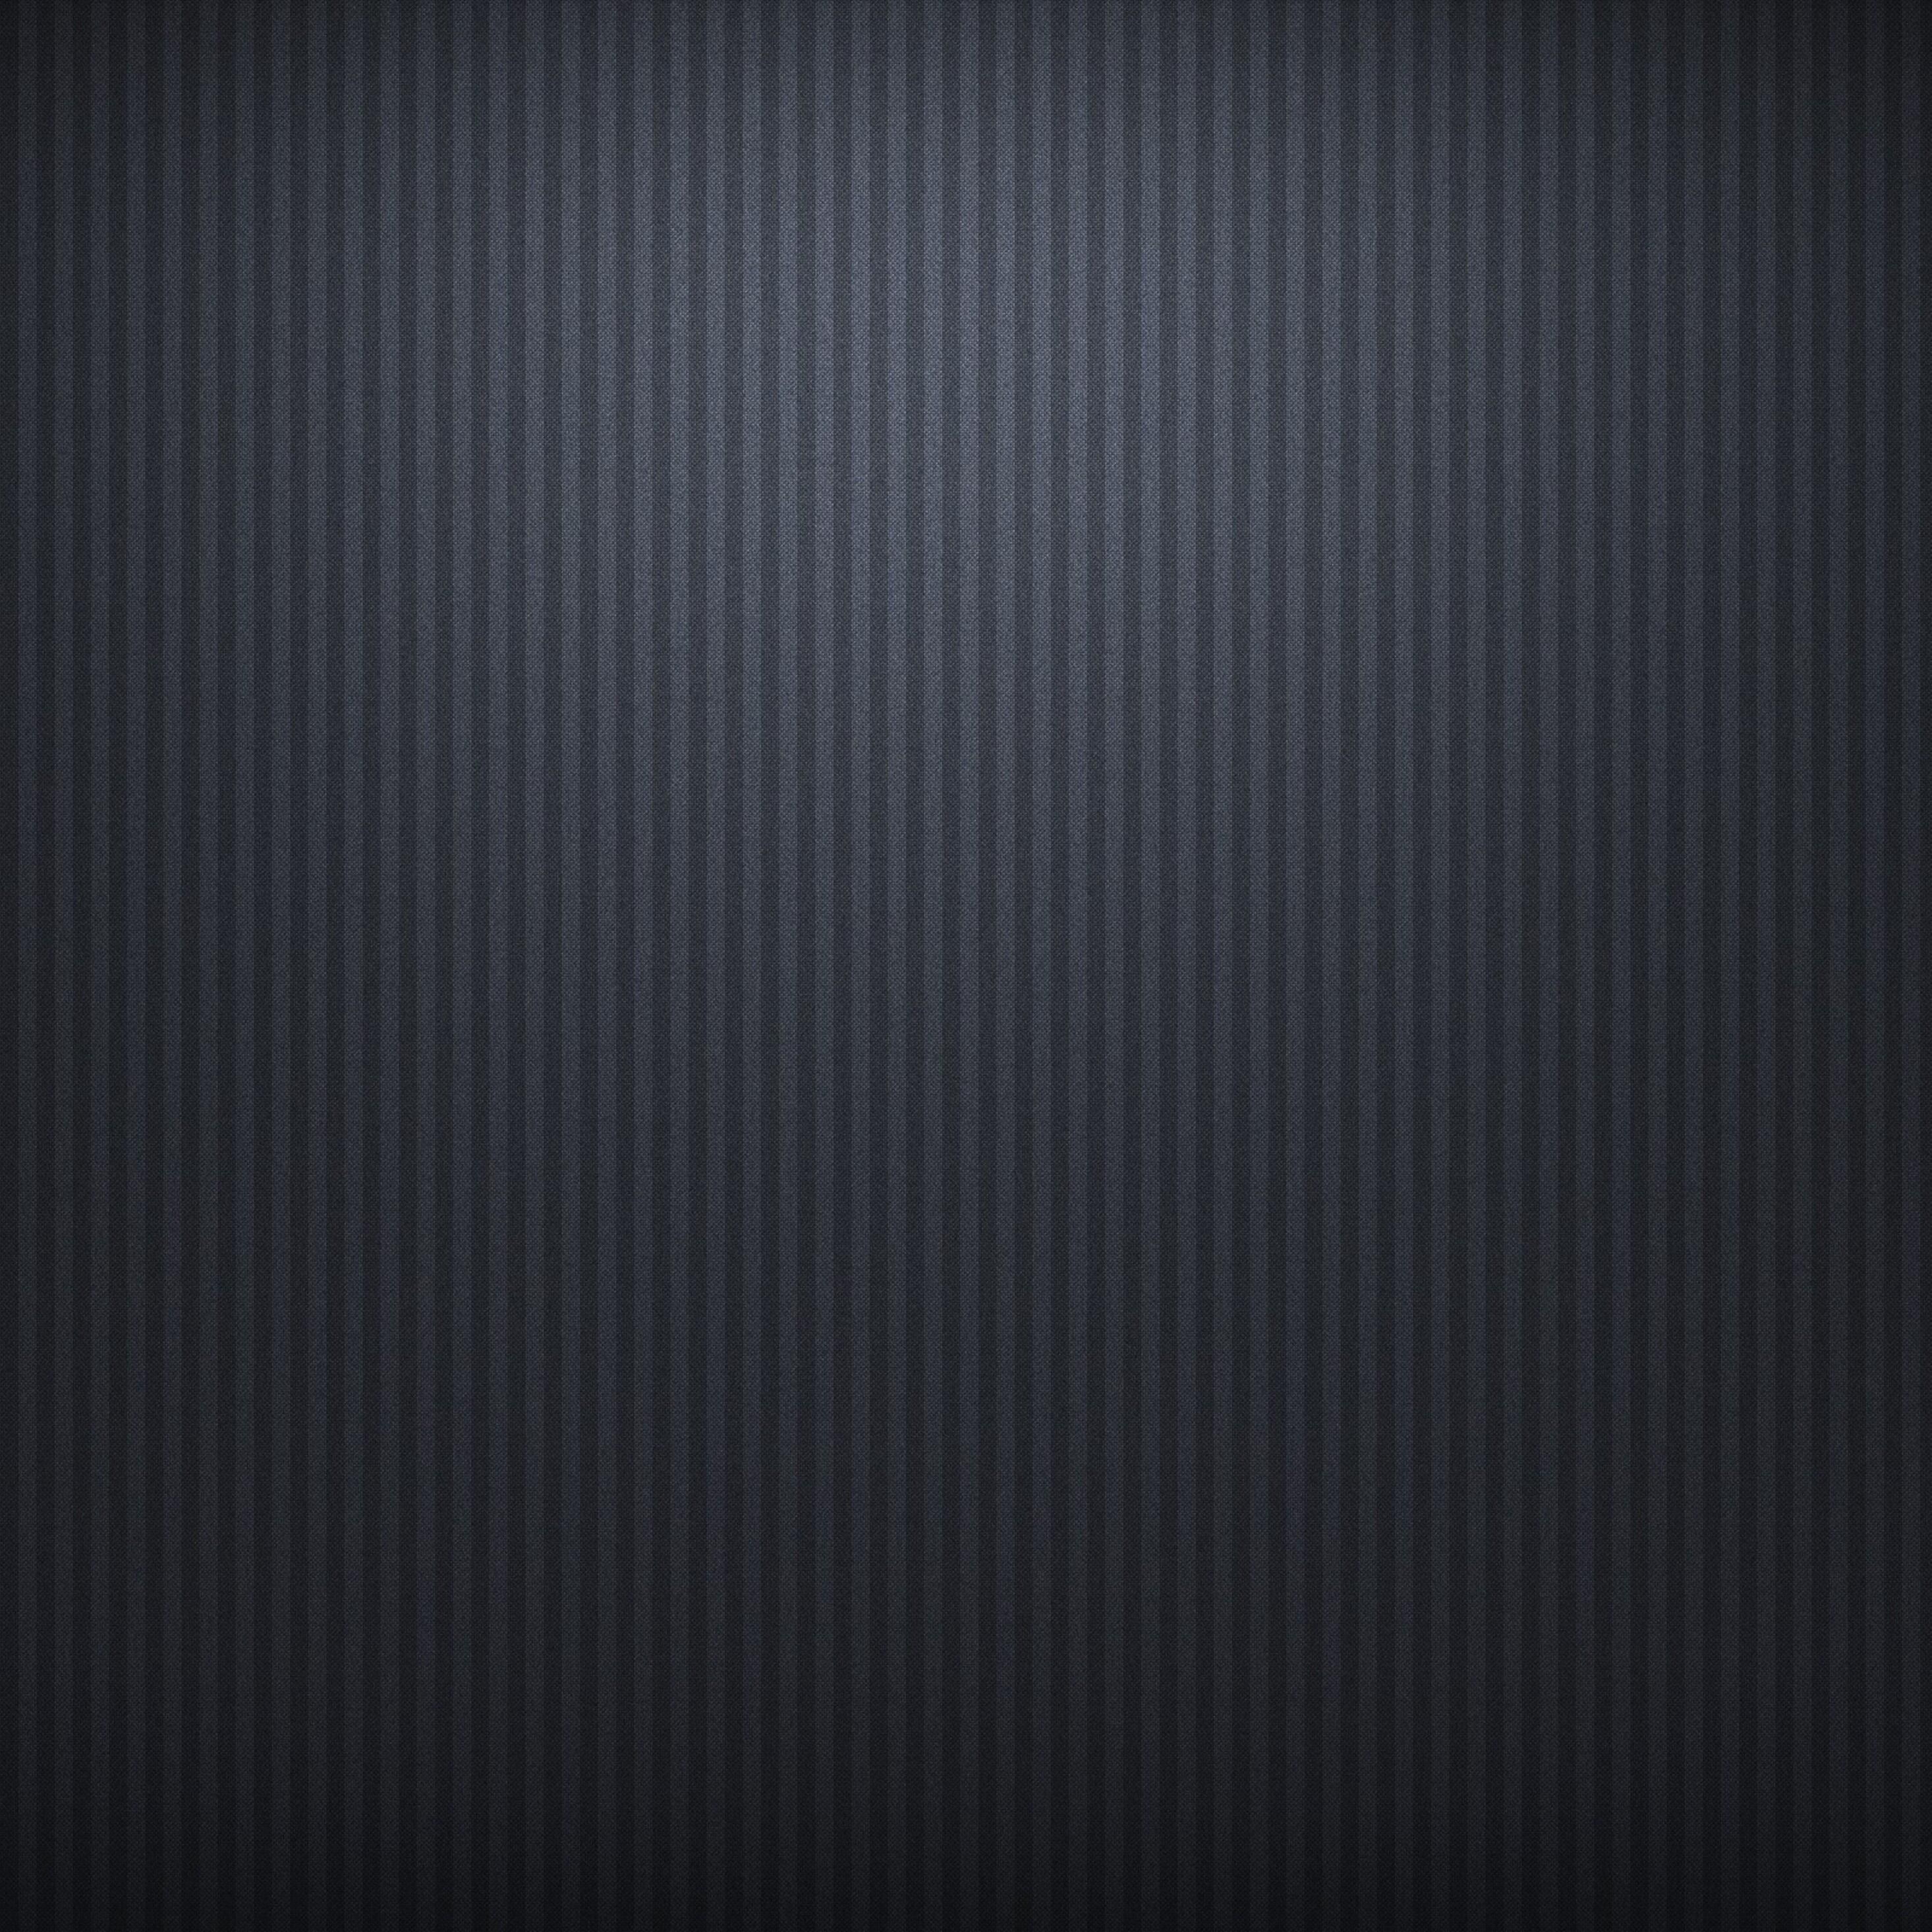 texture-abstract-minimalism-i6.jpg